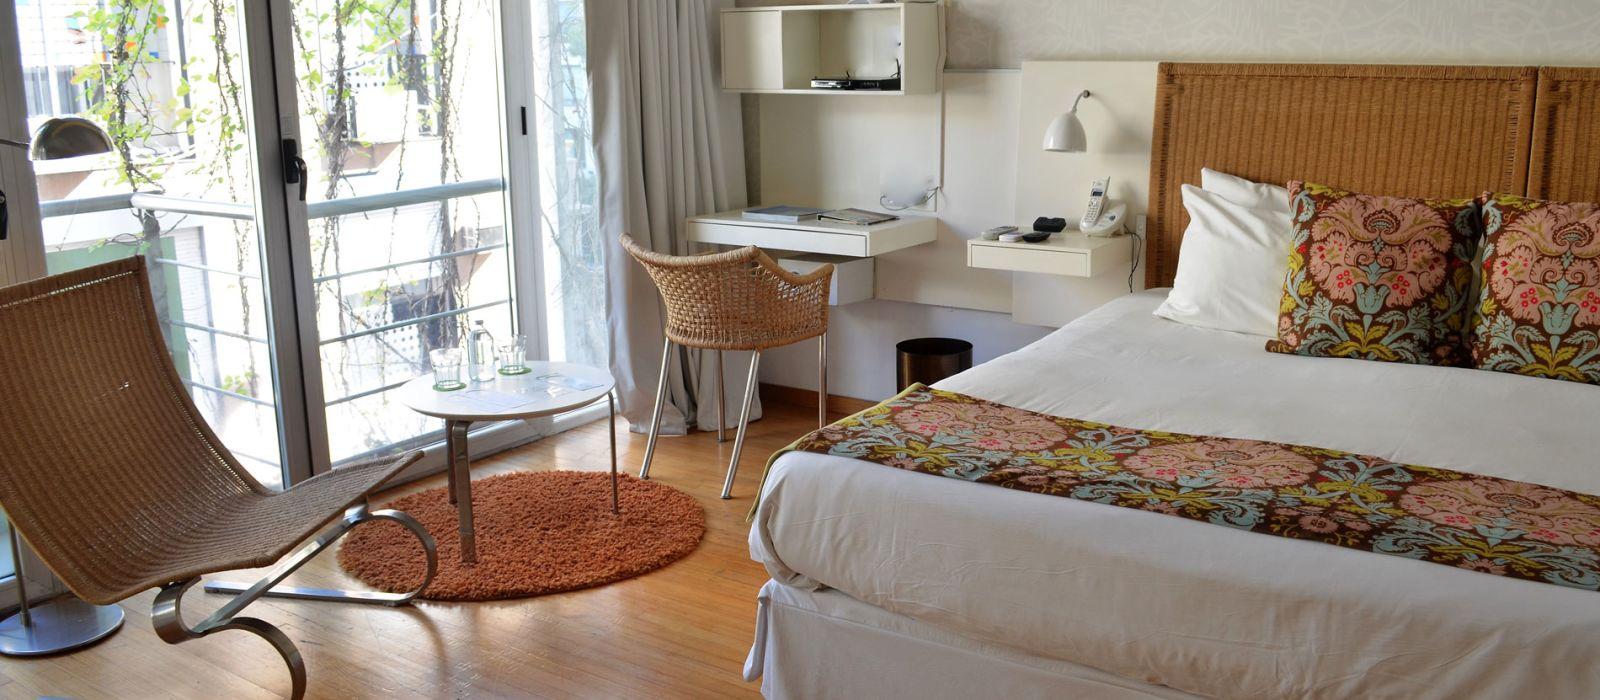 Hotel Casa Calma Argentina